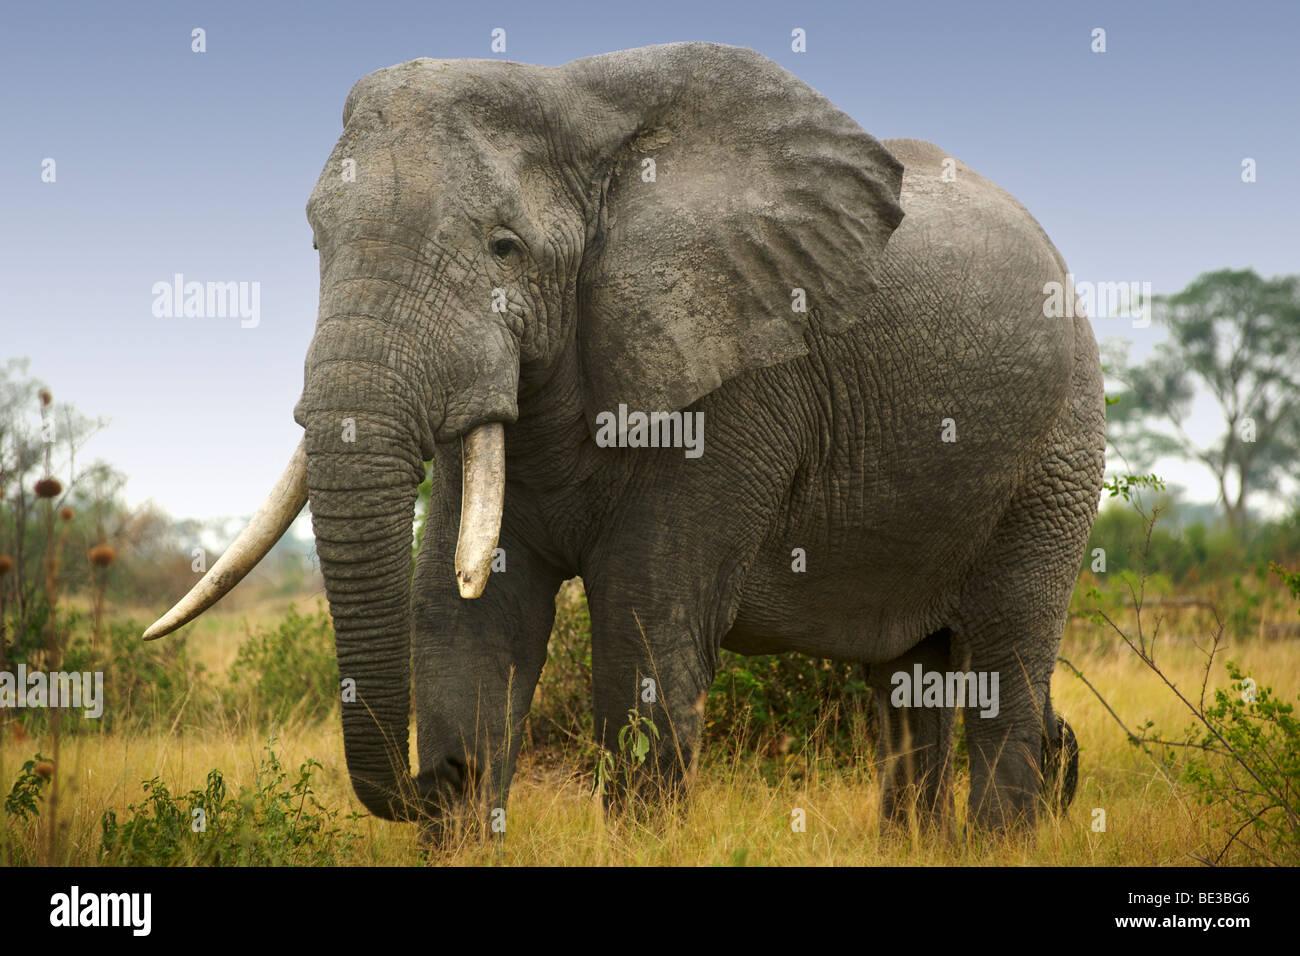 Elefante africano (Loxodonta africana) a Ishasha nel Queen Elizabeth National Park in Uganda. Immagini Stock